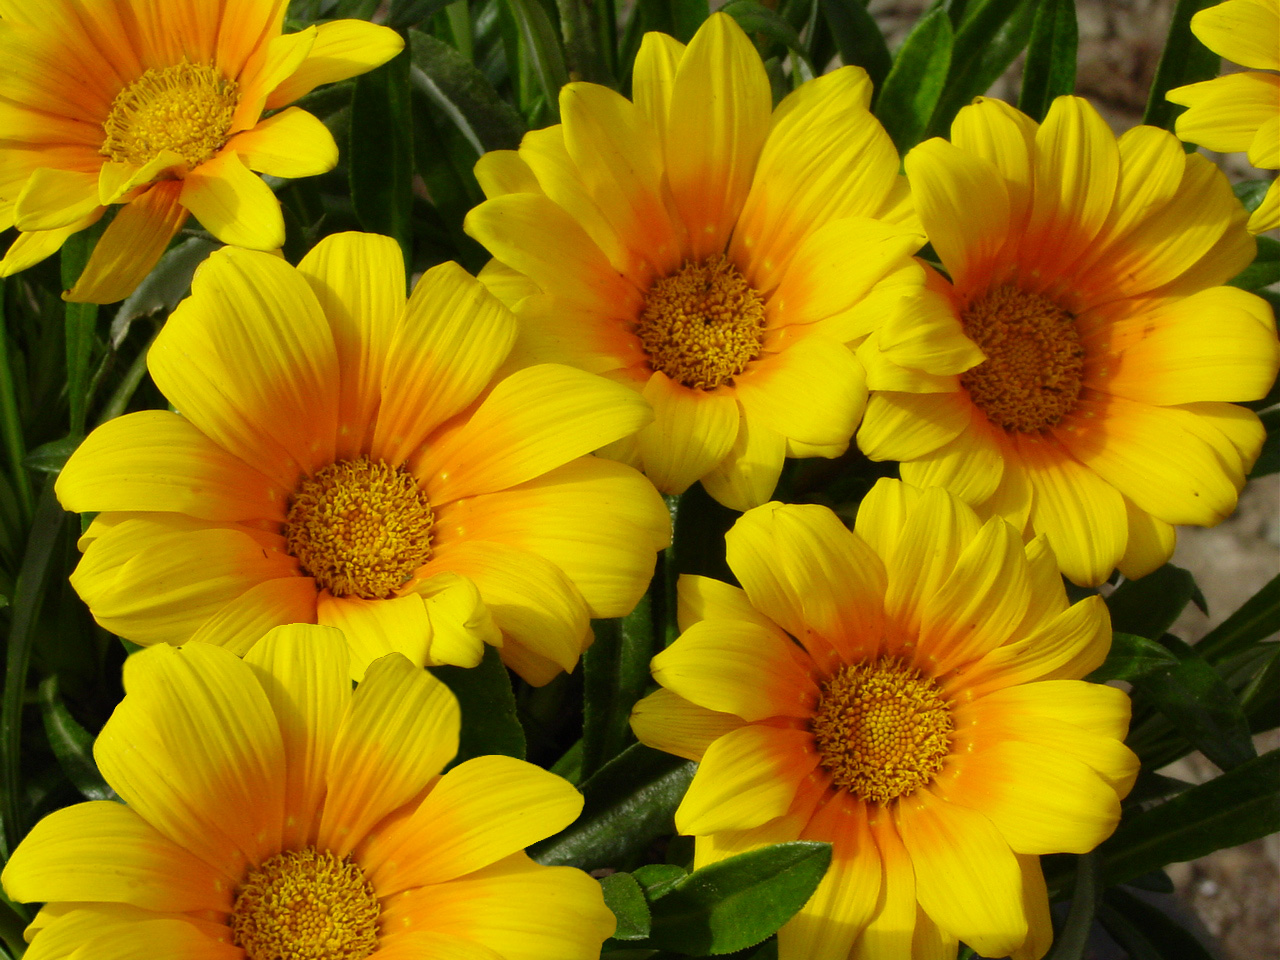 Golden yellow flowers dlt growers gazania trailing green leaf california gold mightylinksfo